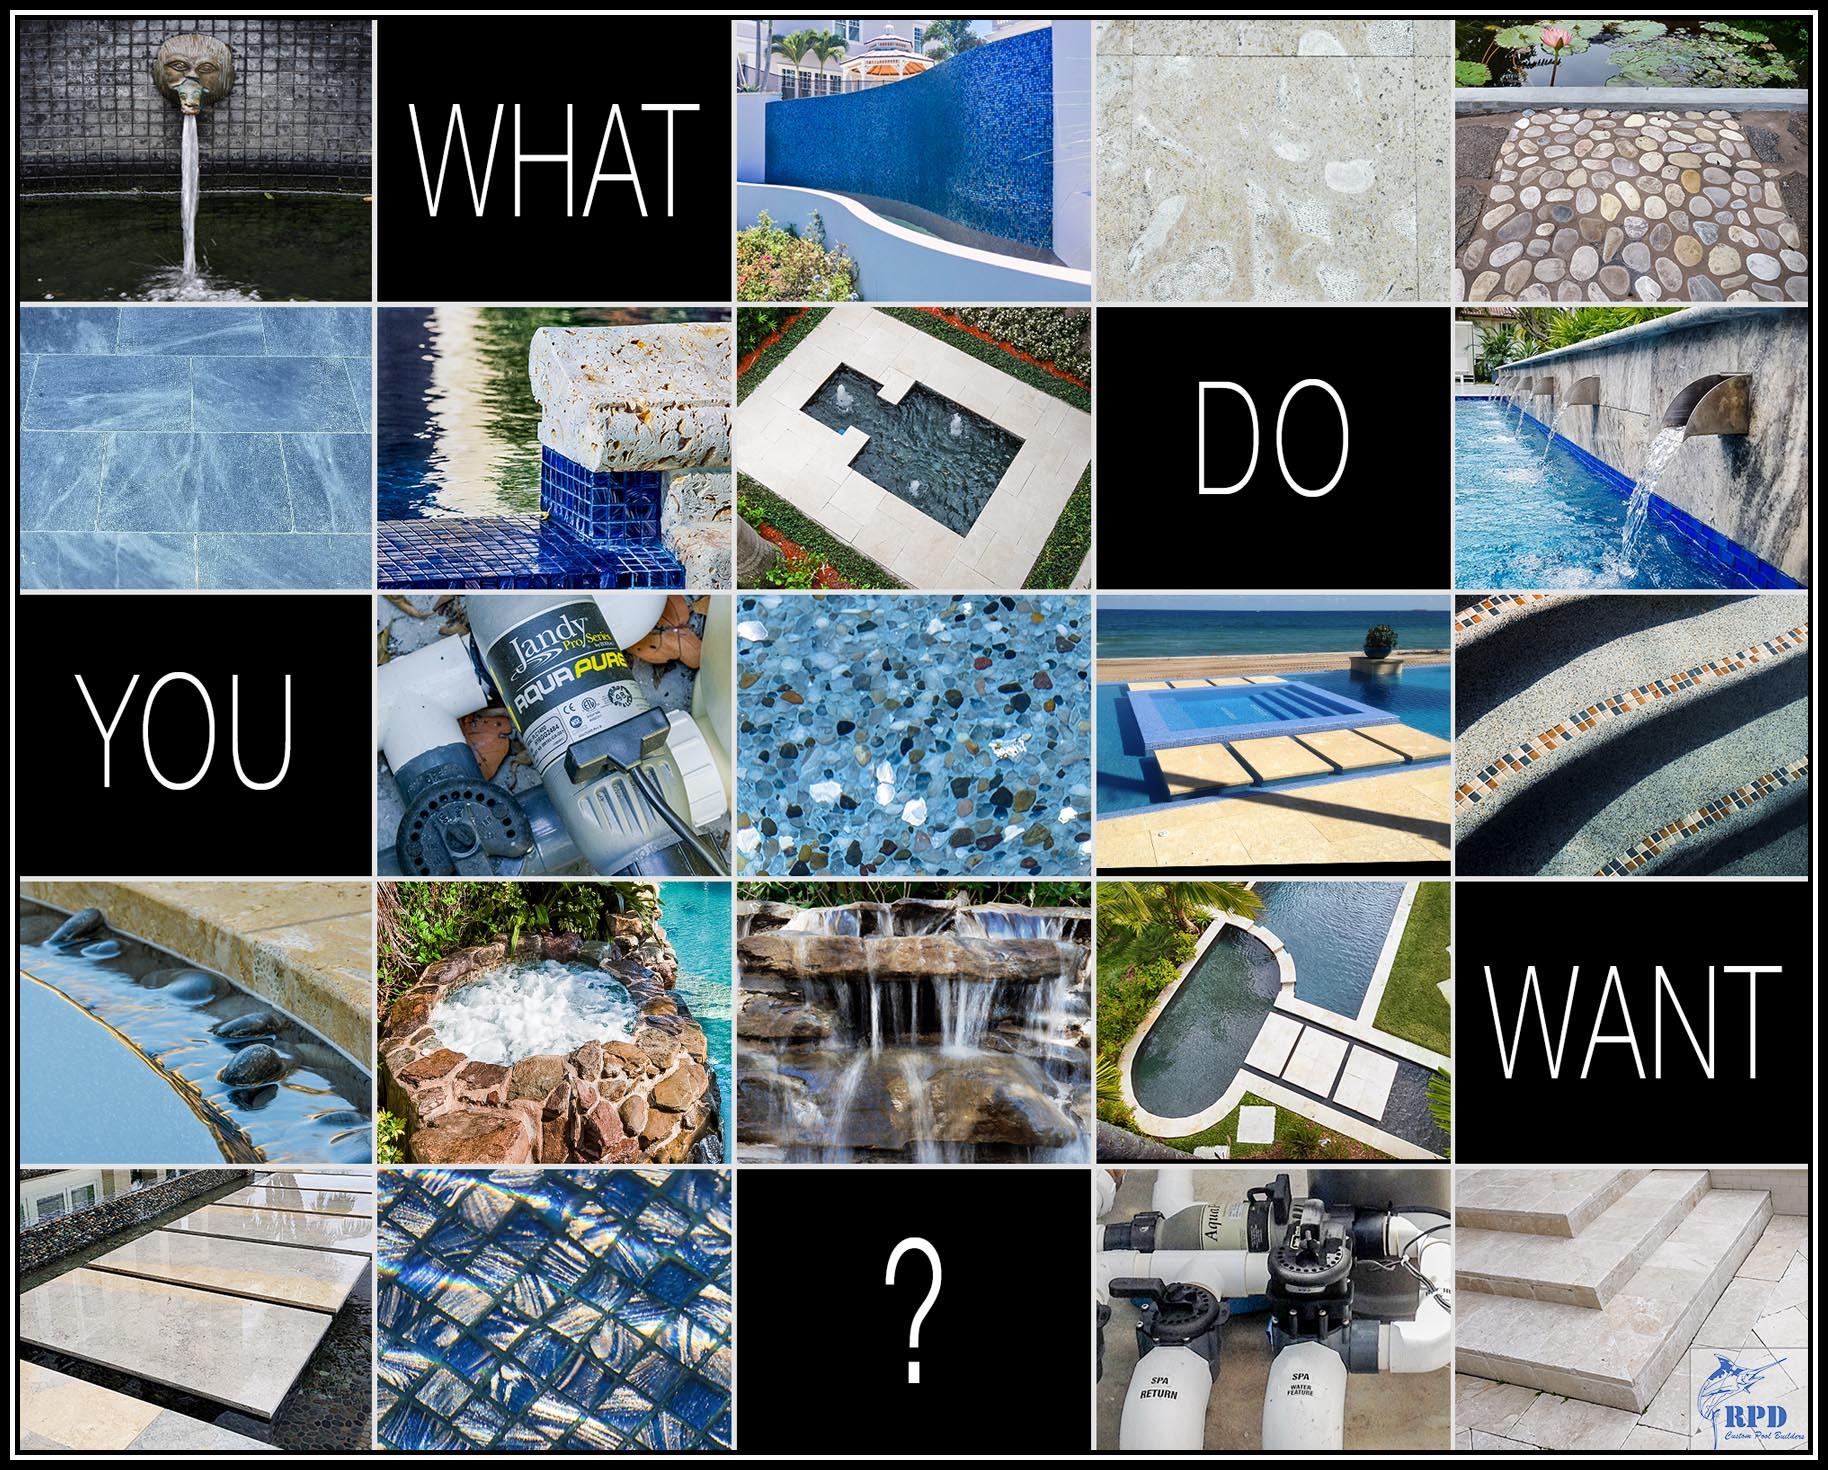 RPD-Swimming-Pool-Value-Palm-Beach-Florida.jpg